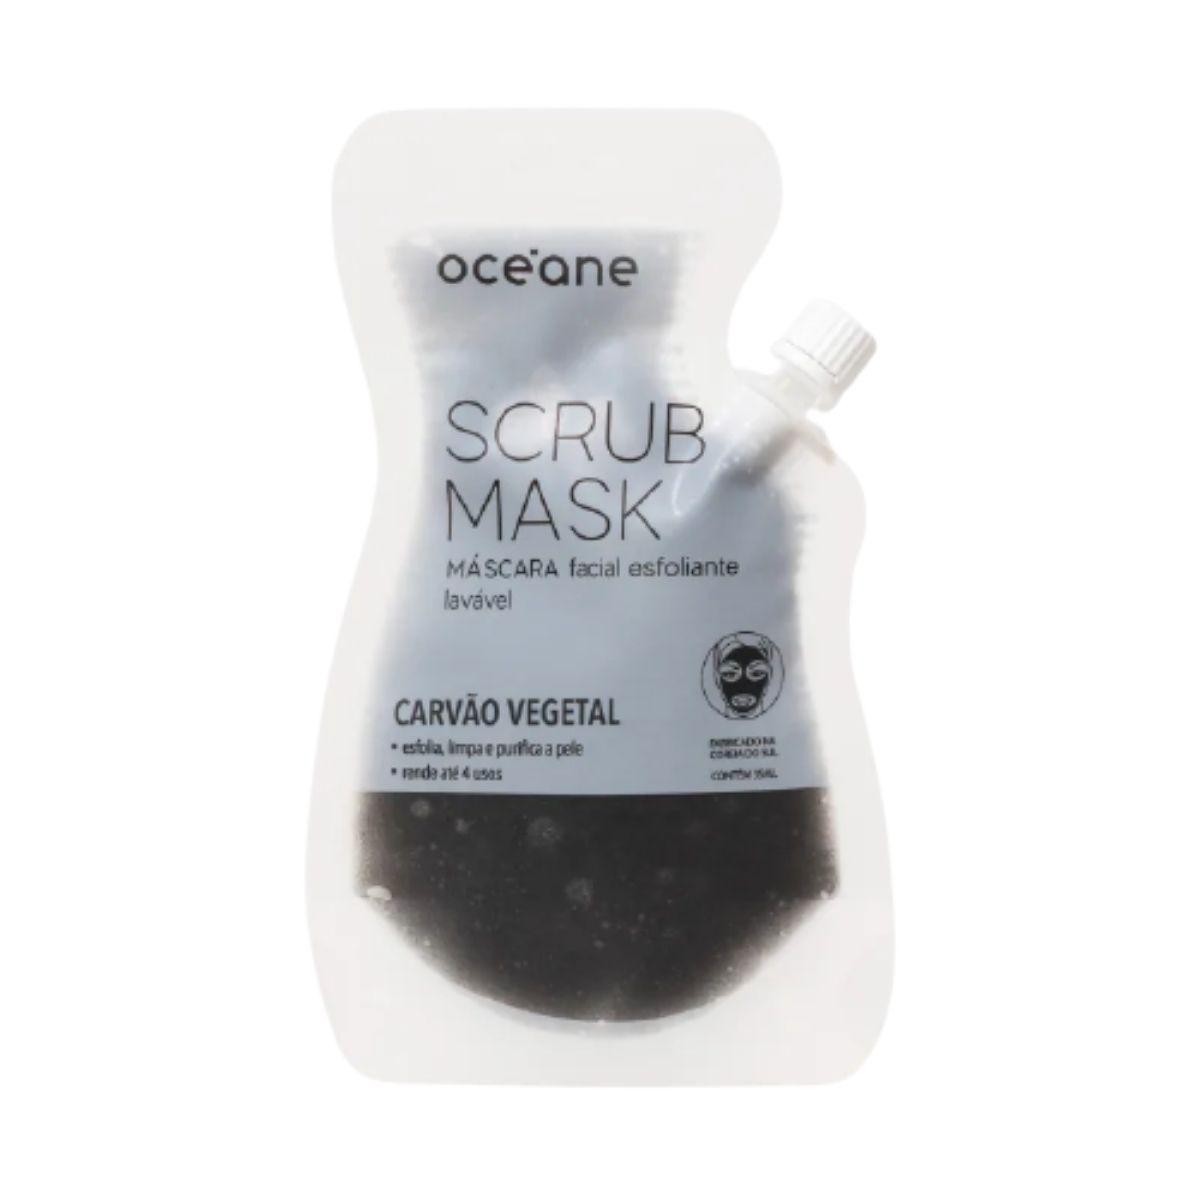 Máscara Facial Esfoliante Carvão Vegetal - Scrub Mask - Oceane